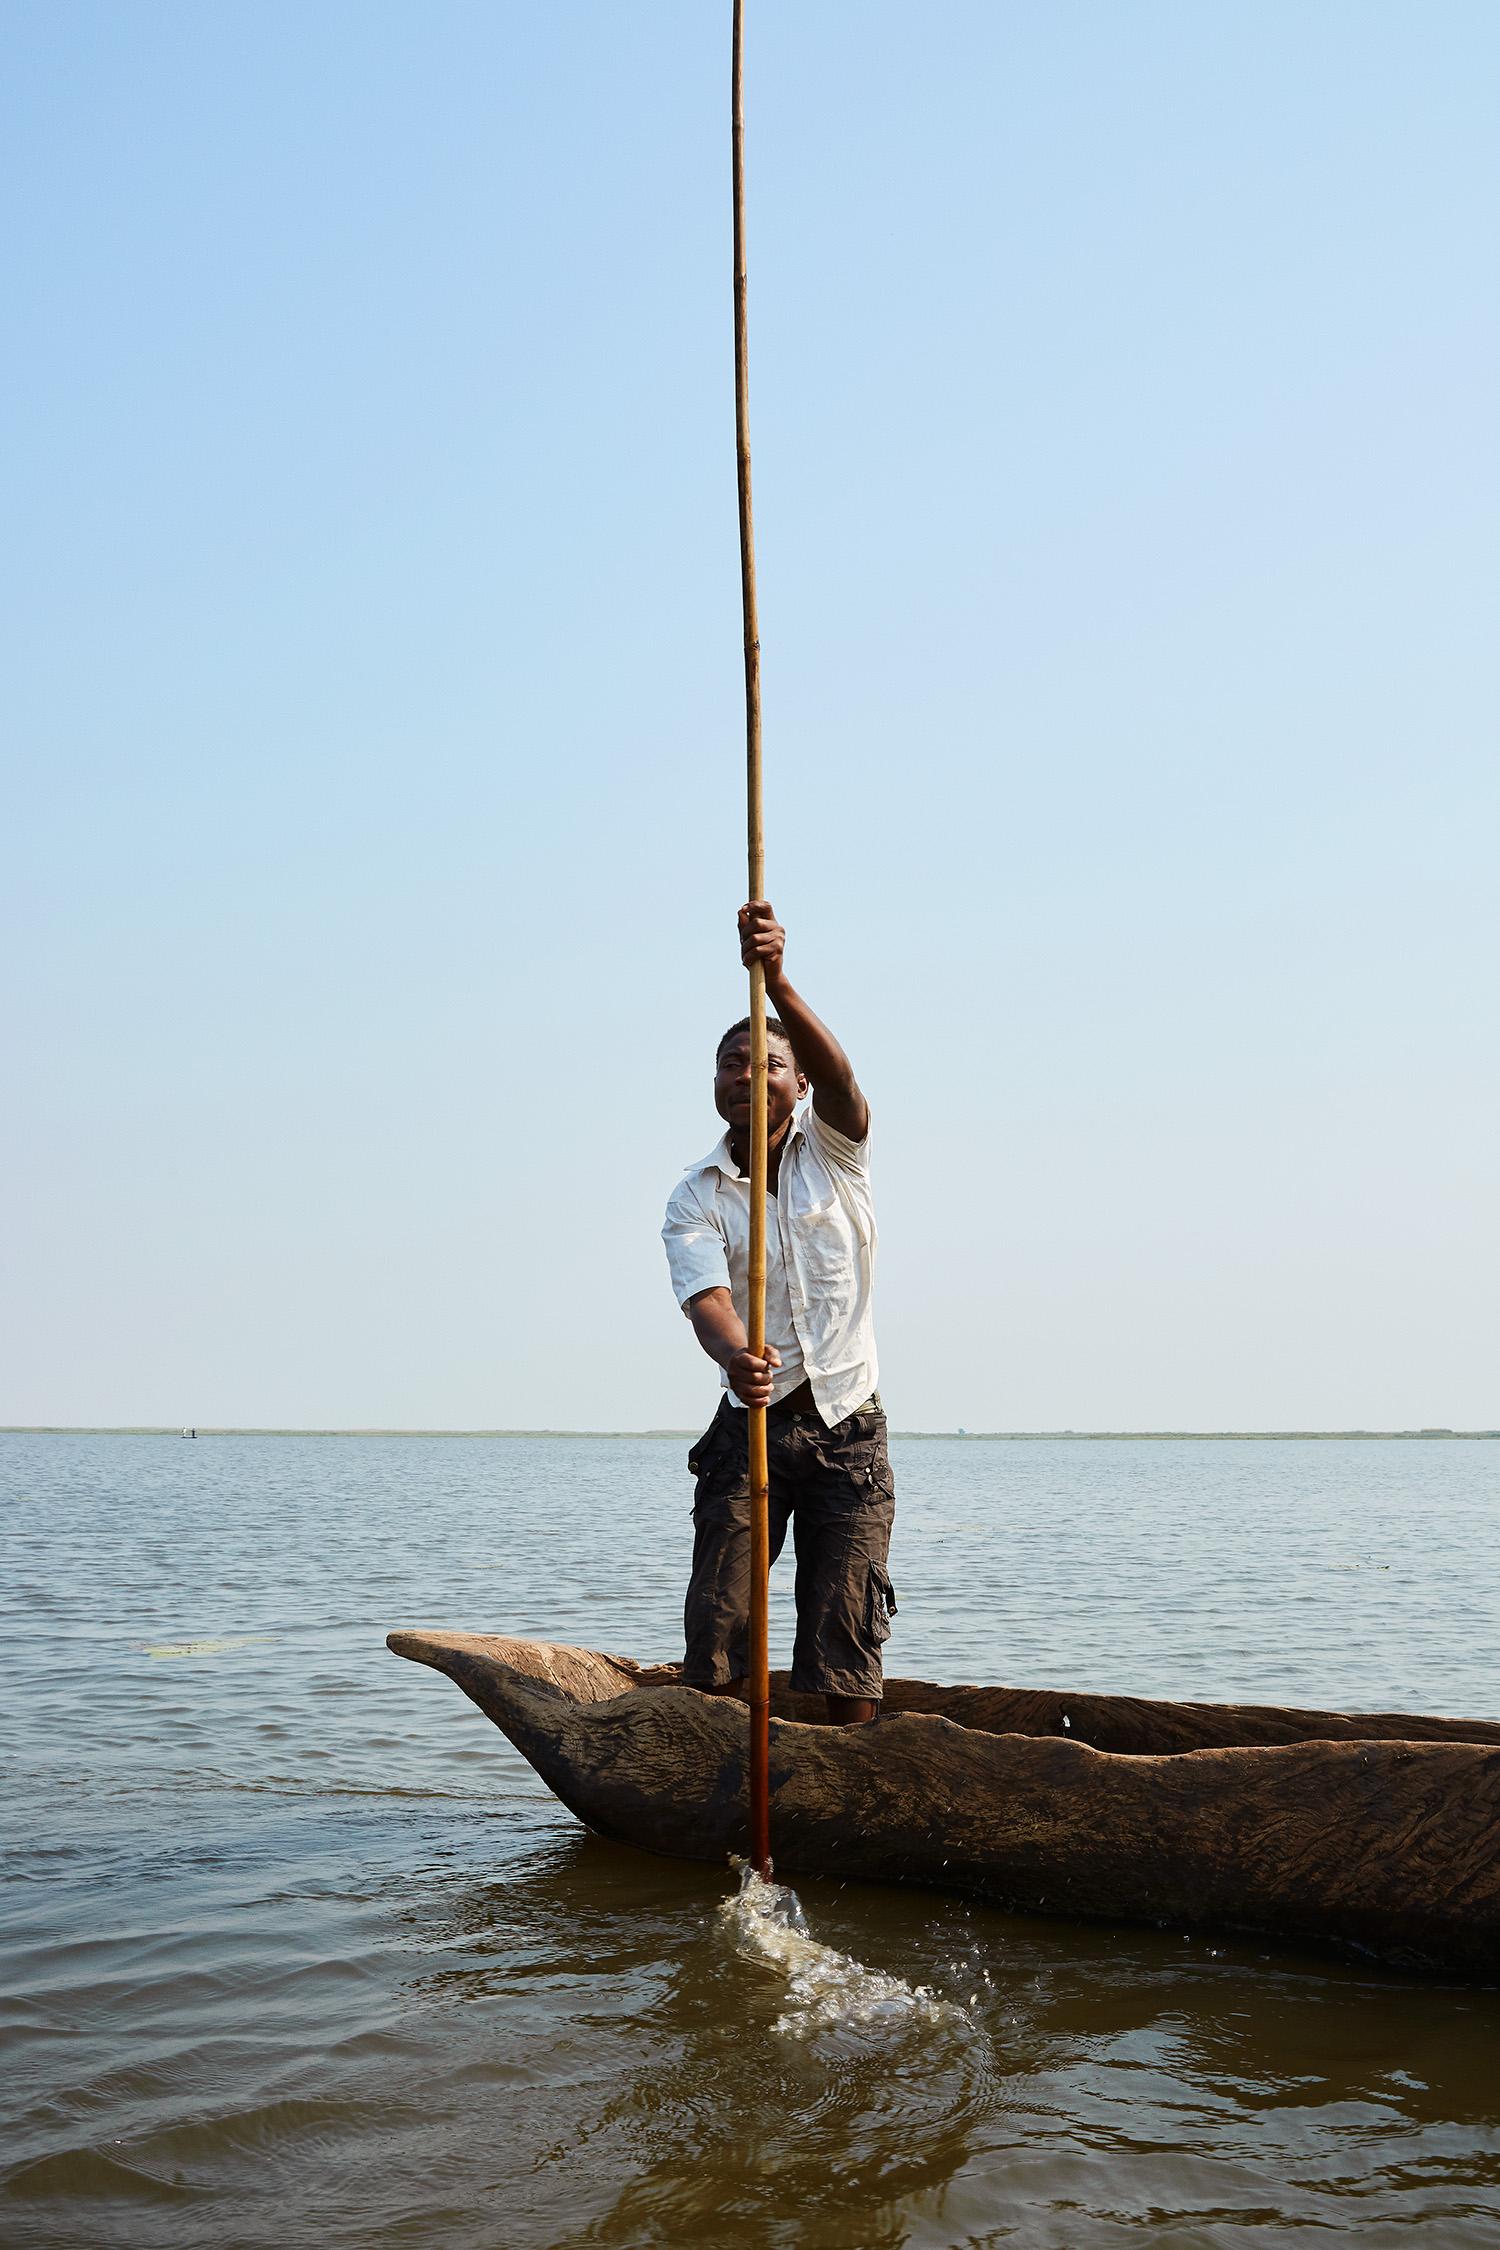 Fisherman #4